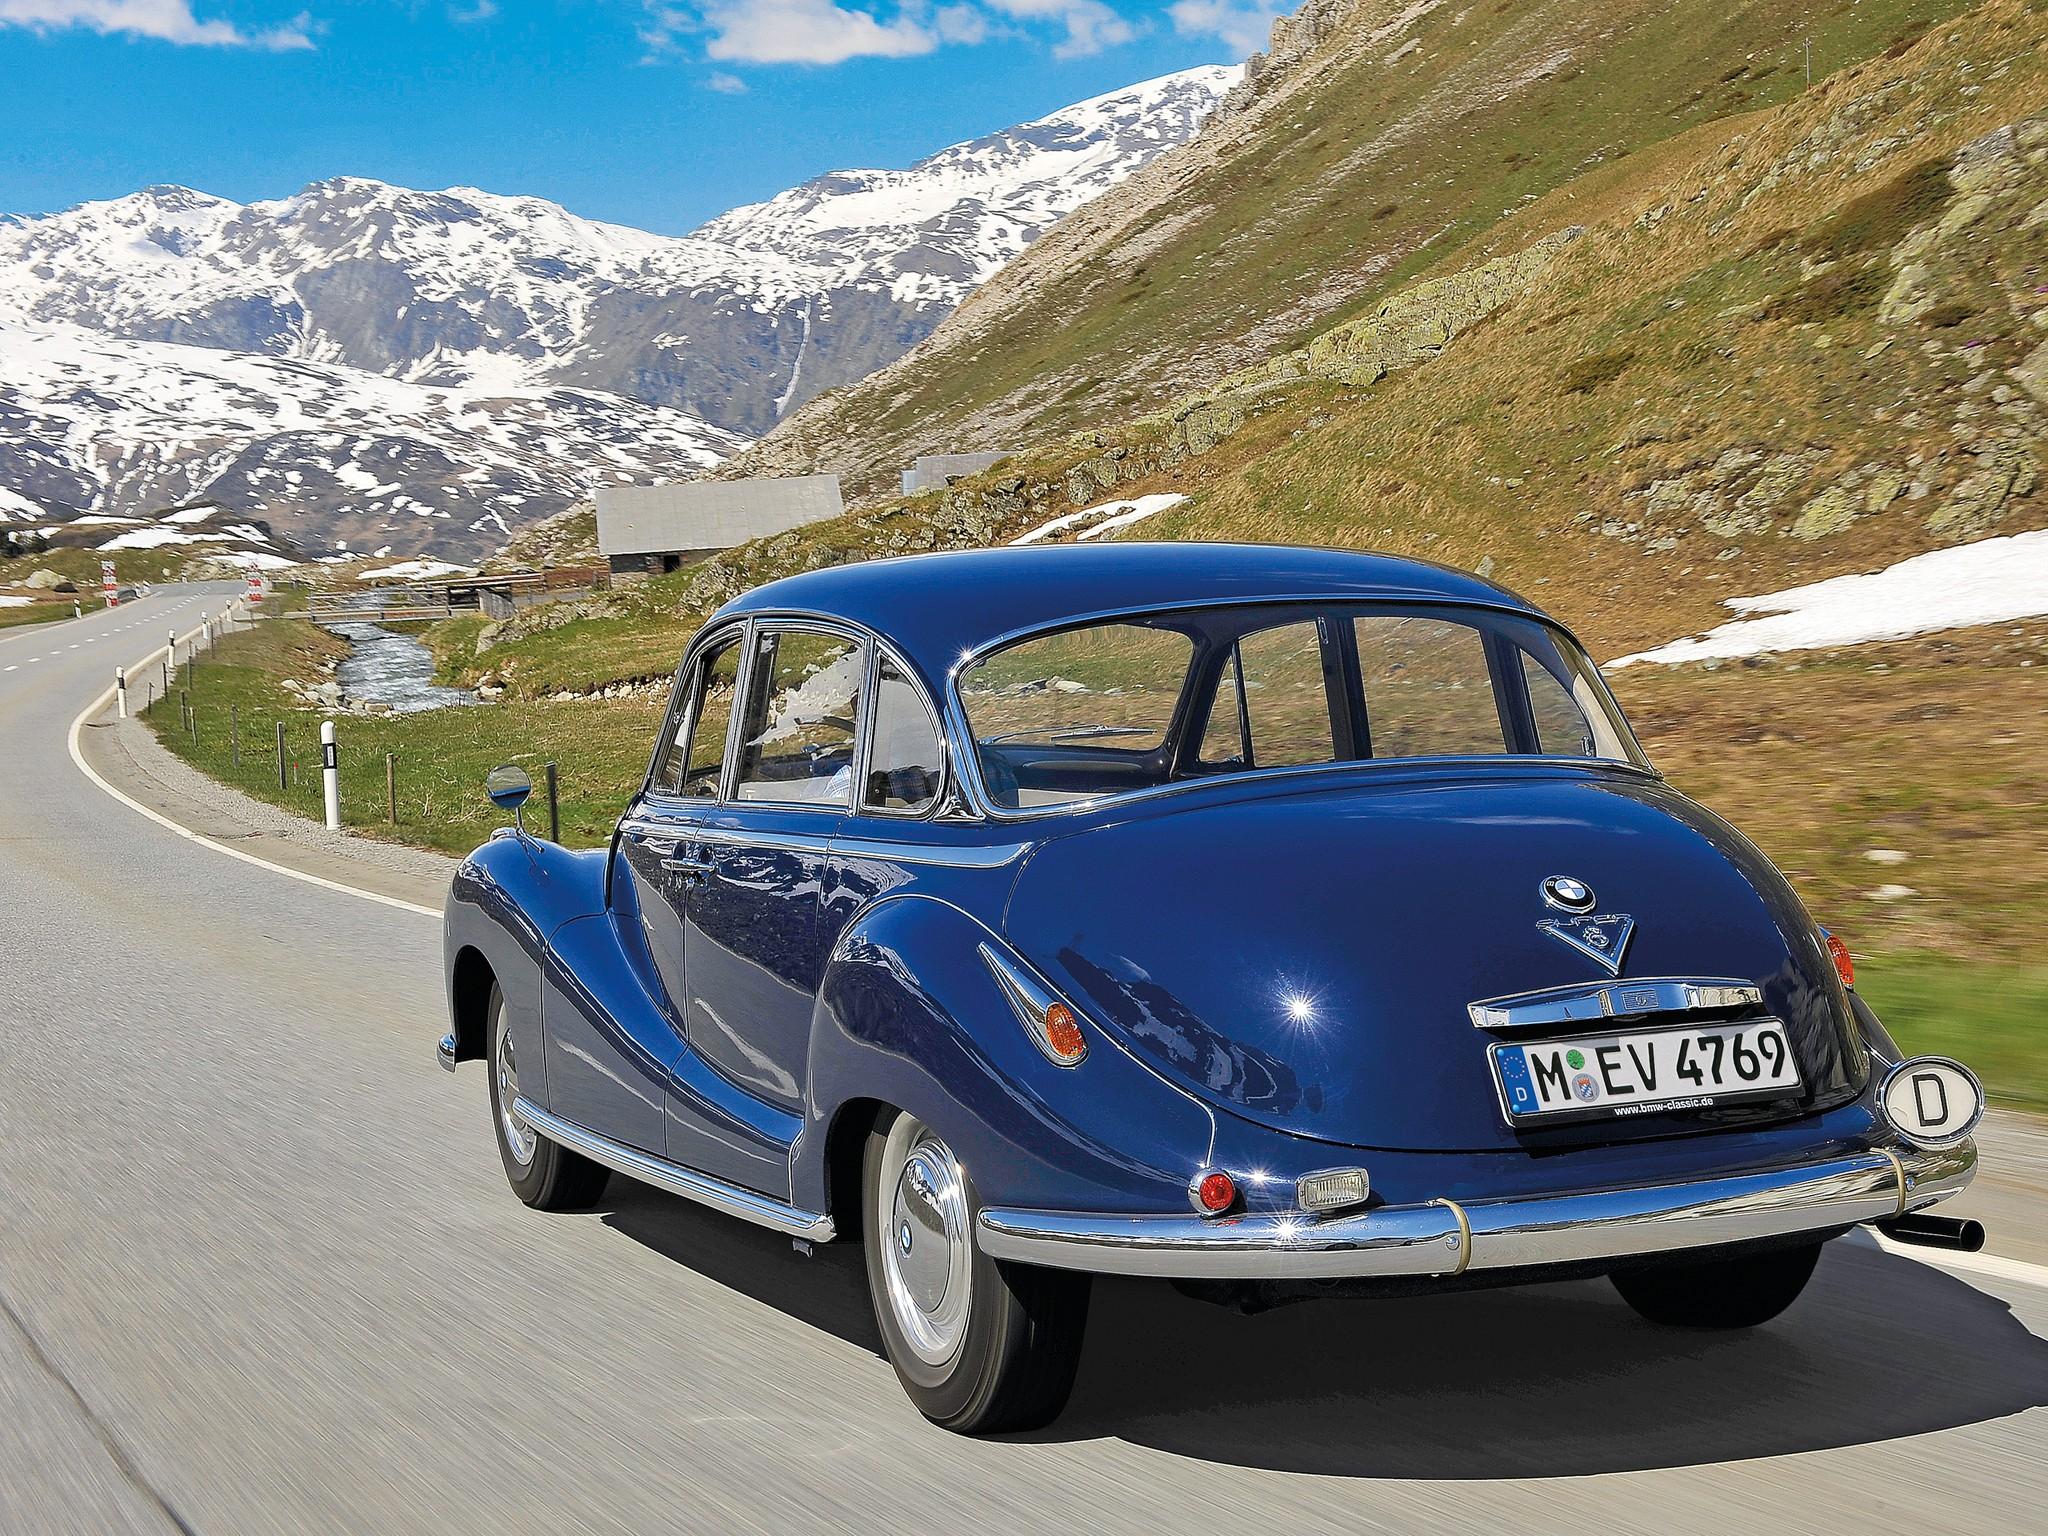 First Choice Automotive >> BMW 501/502 - 1952, 1953, 1954, 1955, 1956, 1957, 1958 ...